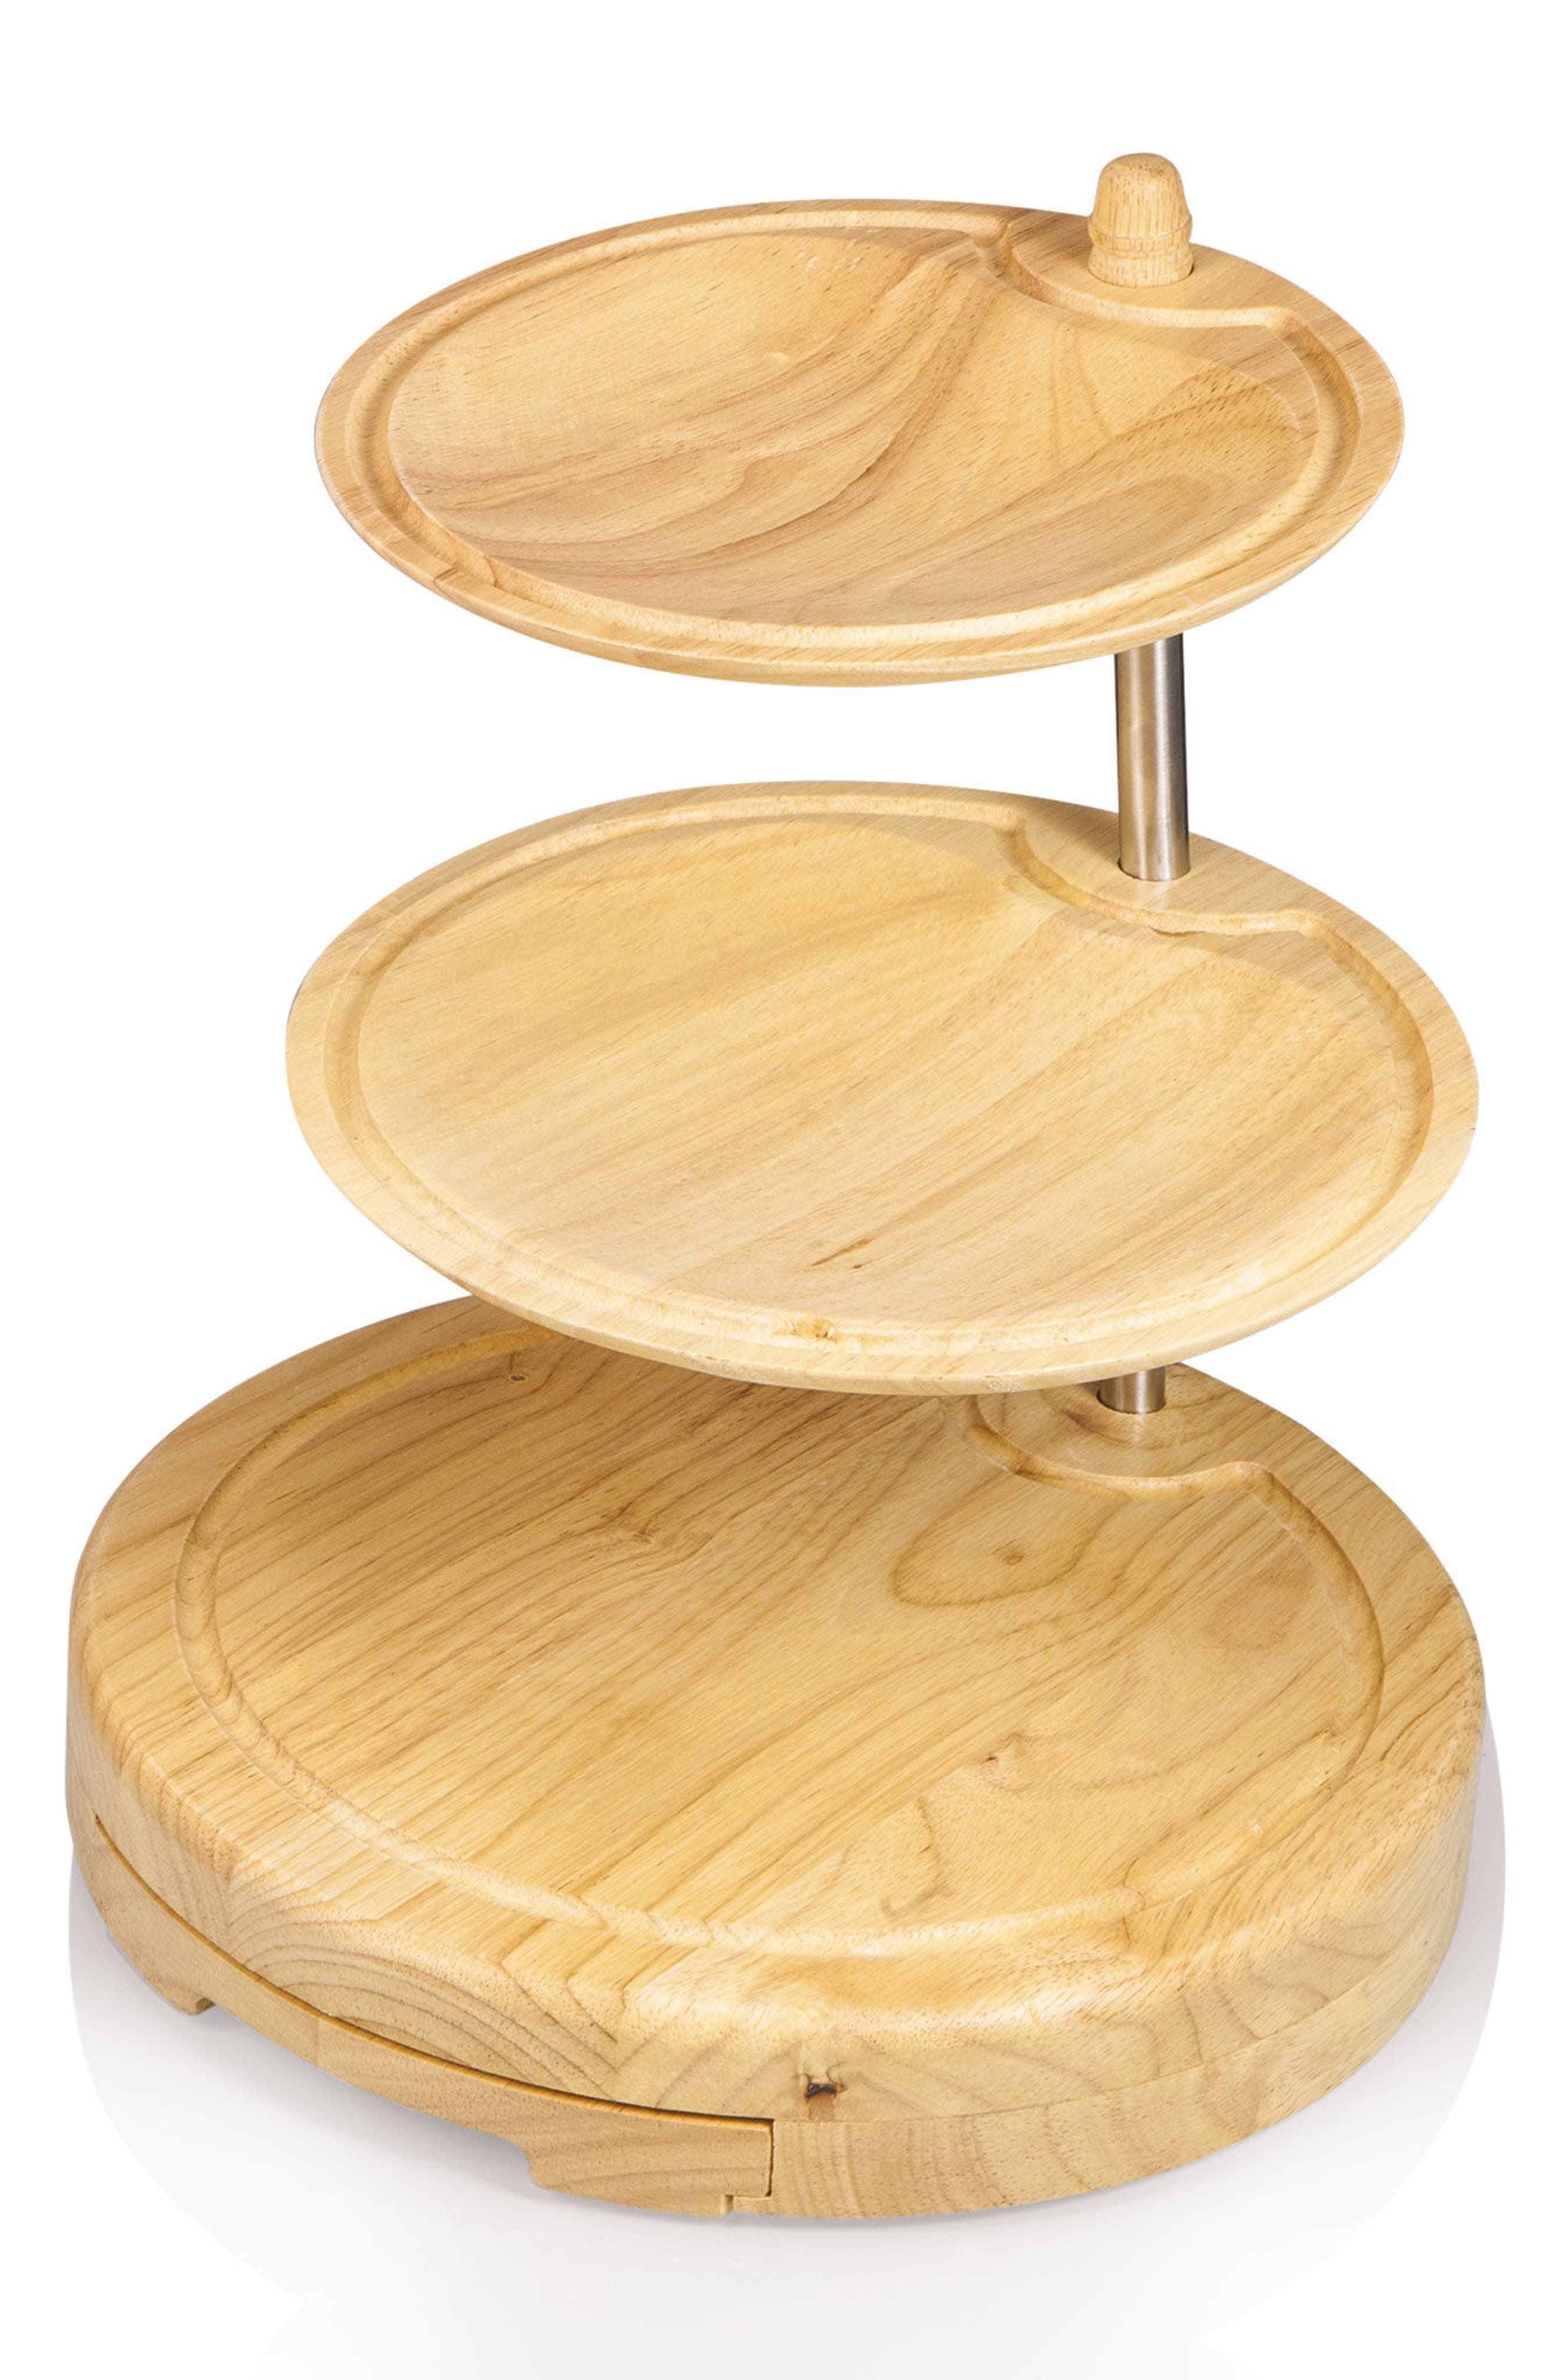 Regalio 3-Tier Cheese Board & Tool Set,                             Alternate thumbnail 3, color,                             200